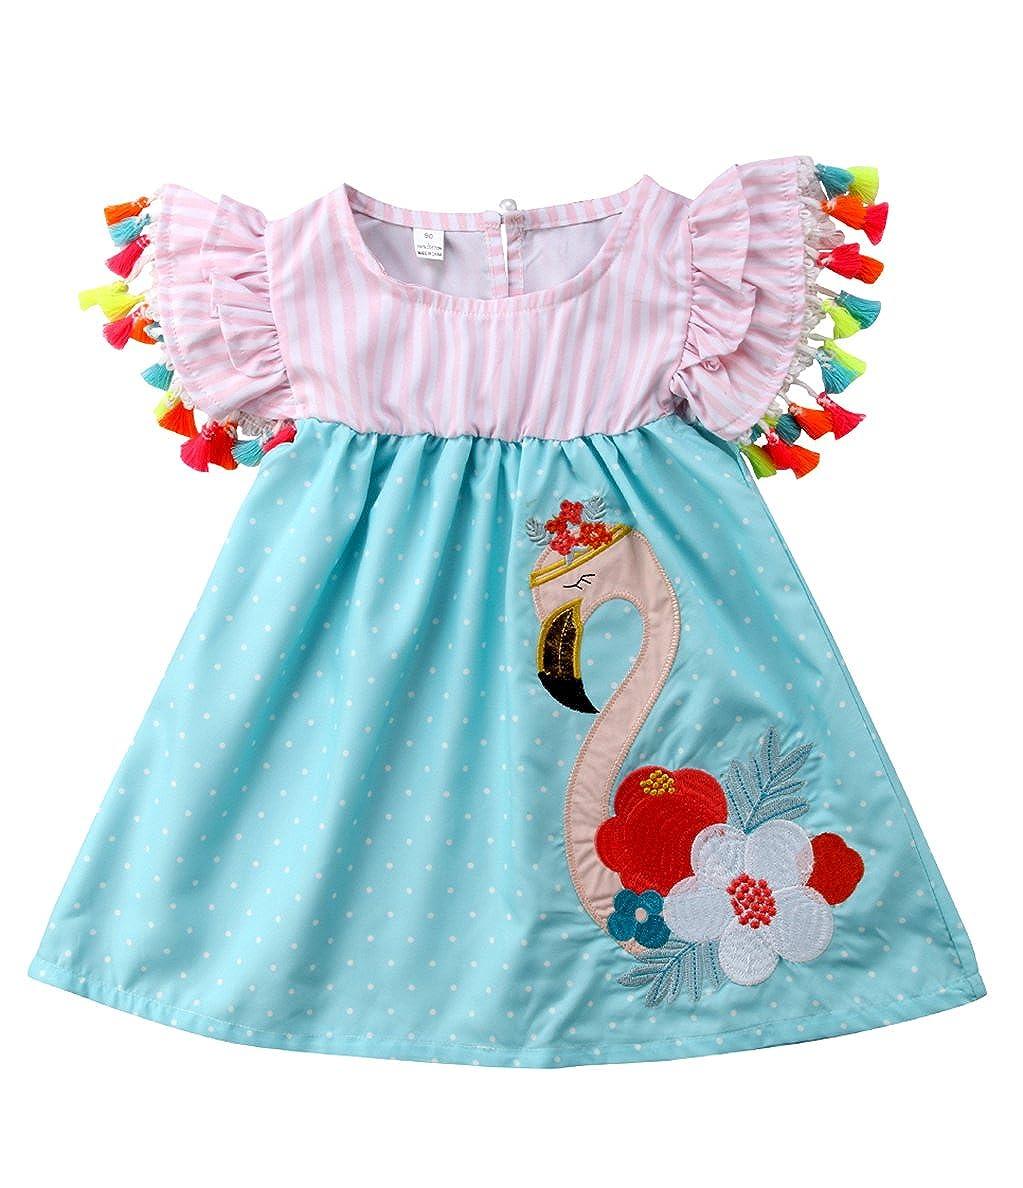 e0366b7f7 Amazon.com  Urkutoba Baby Kid Girls Striped Ruffle Dress Summer ...